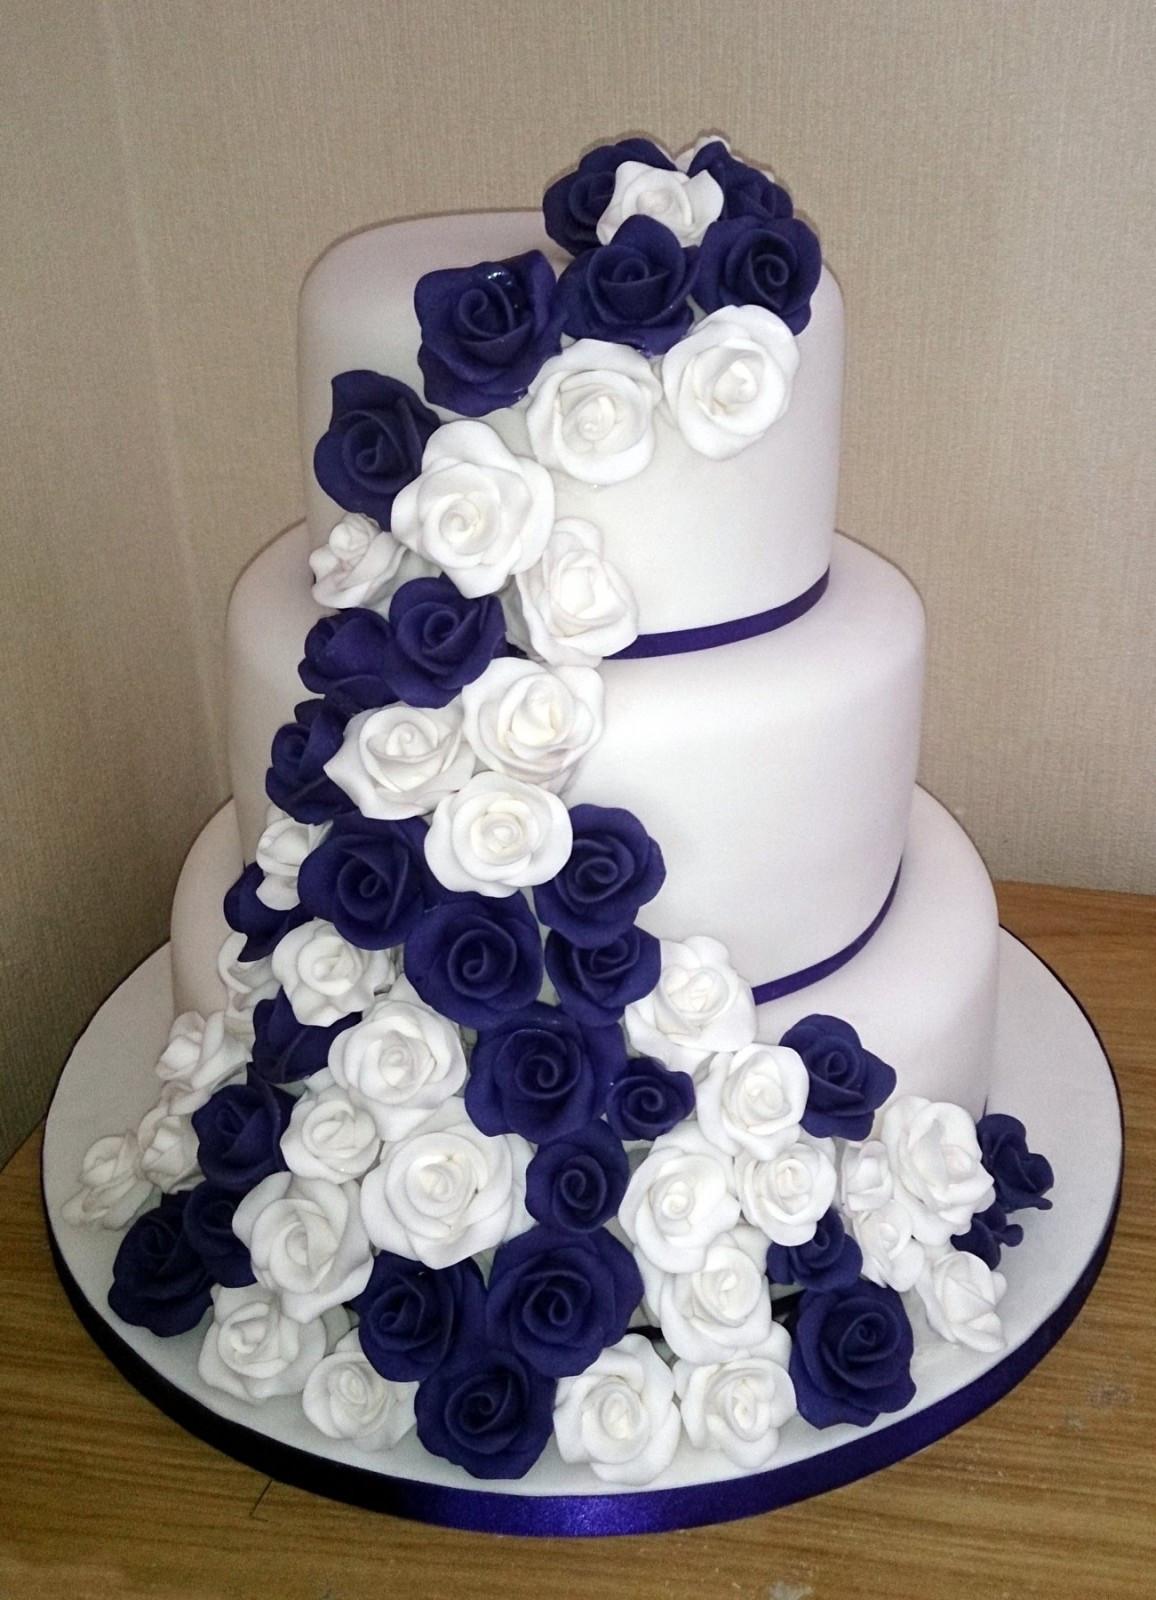 Purple Wedding Cakes With Prices  3 Tier White and Purple Rose Wedding Cake Susie s Cakes